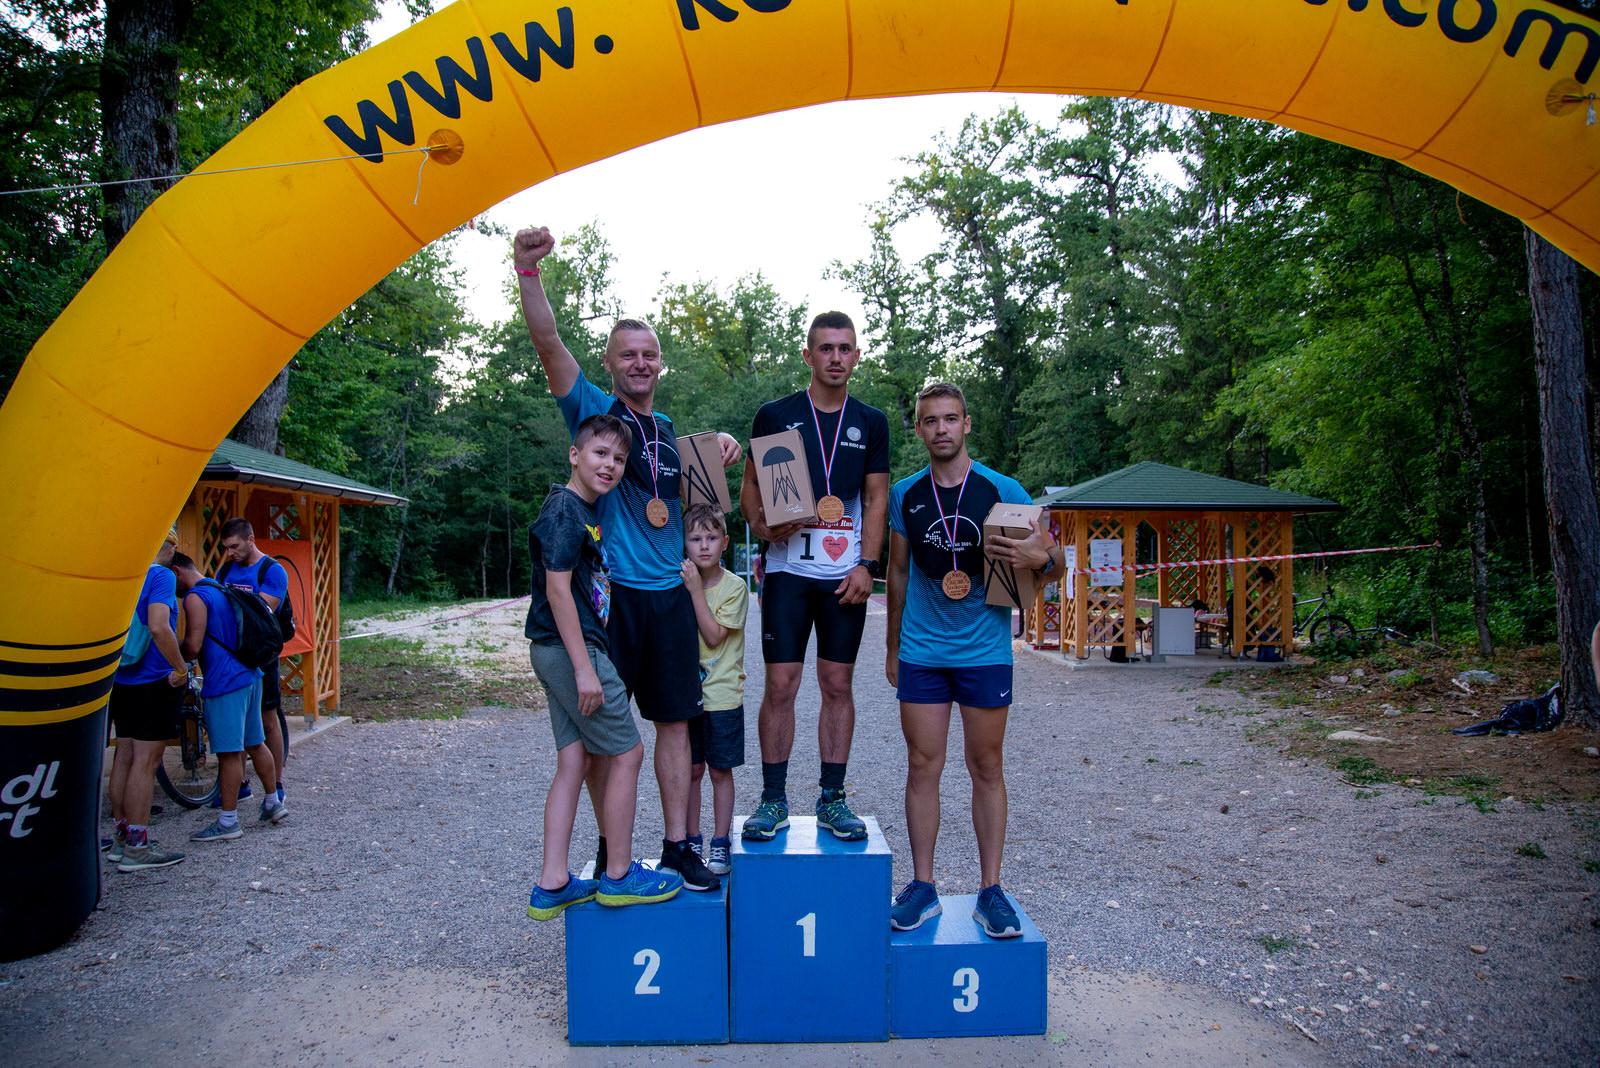 likaclub_lika night run_jasikovac_7_2020 (21)